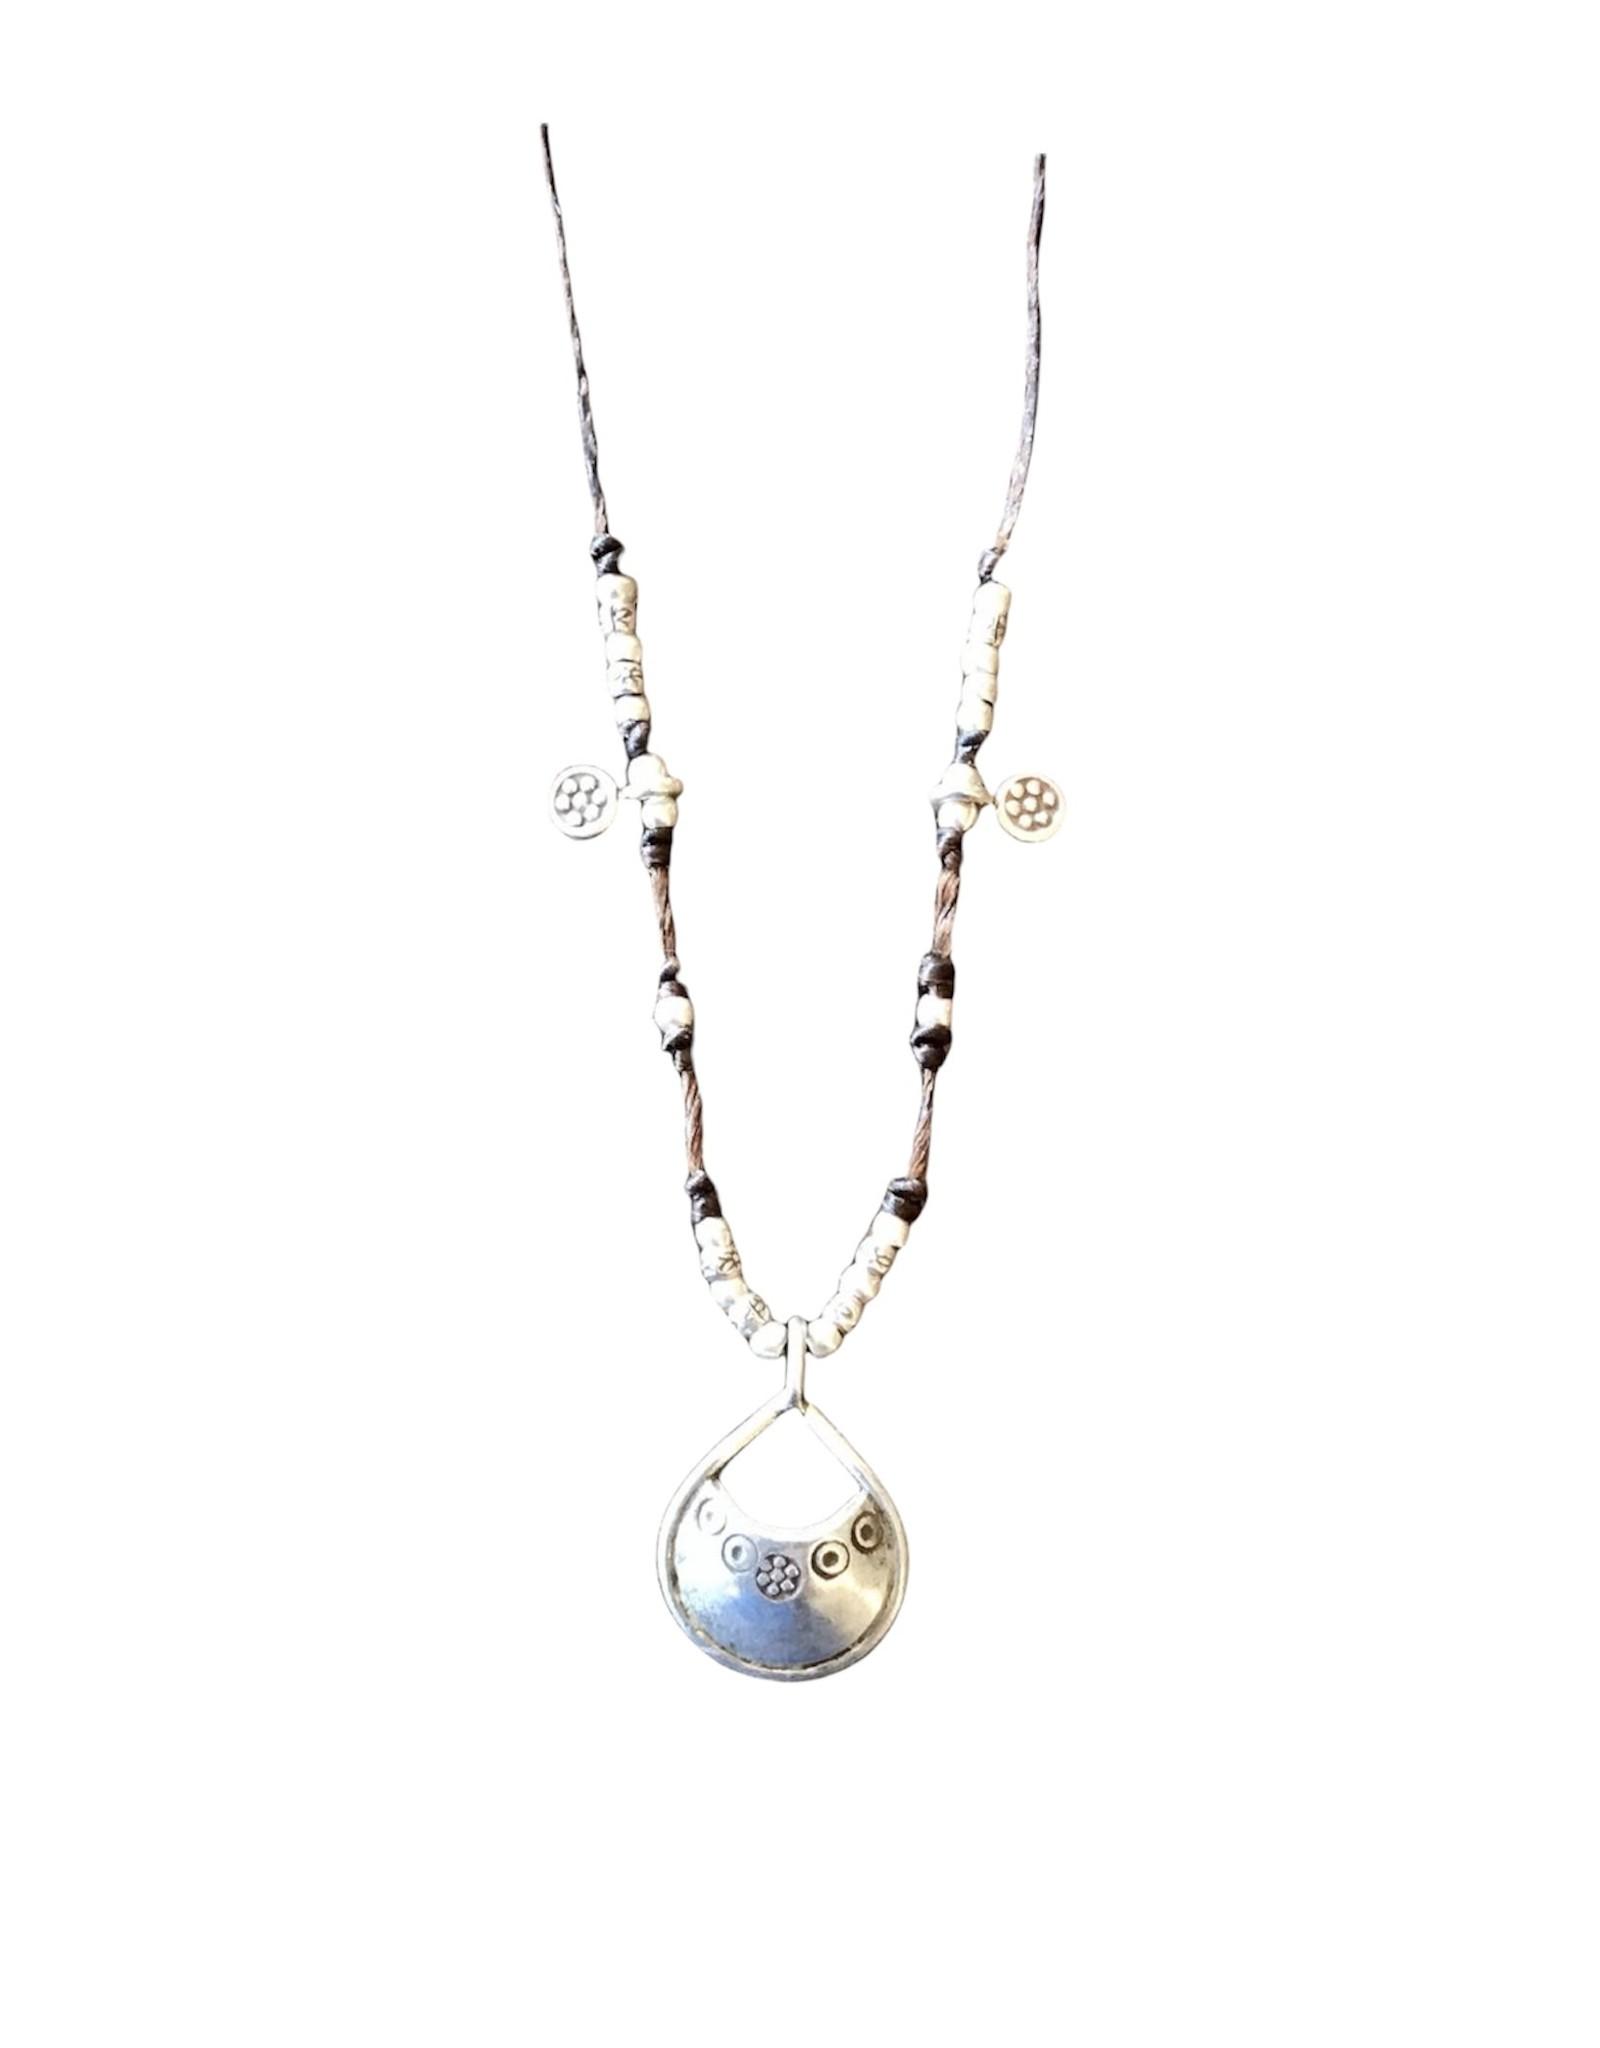 Hill Tribe, Seven Shakras Short Necklace